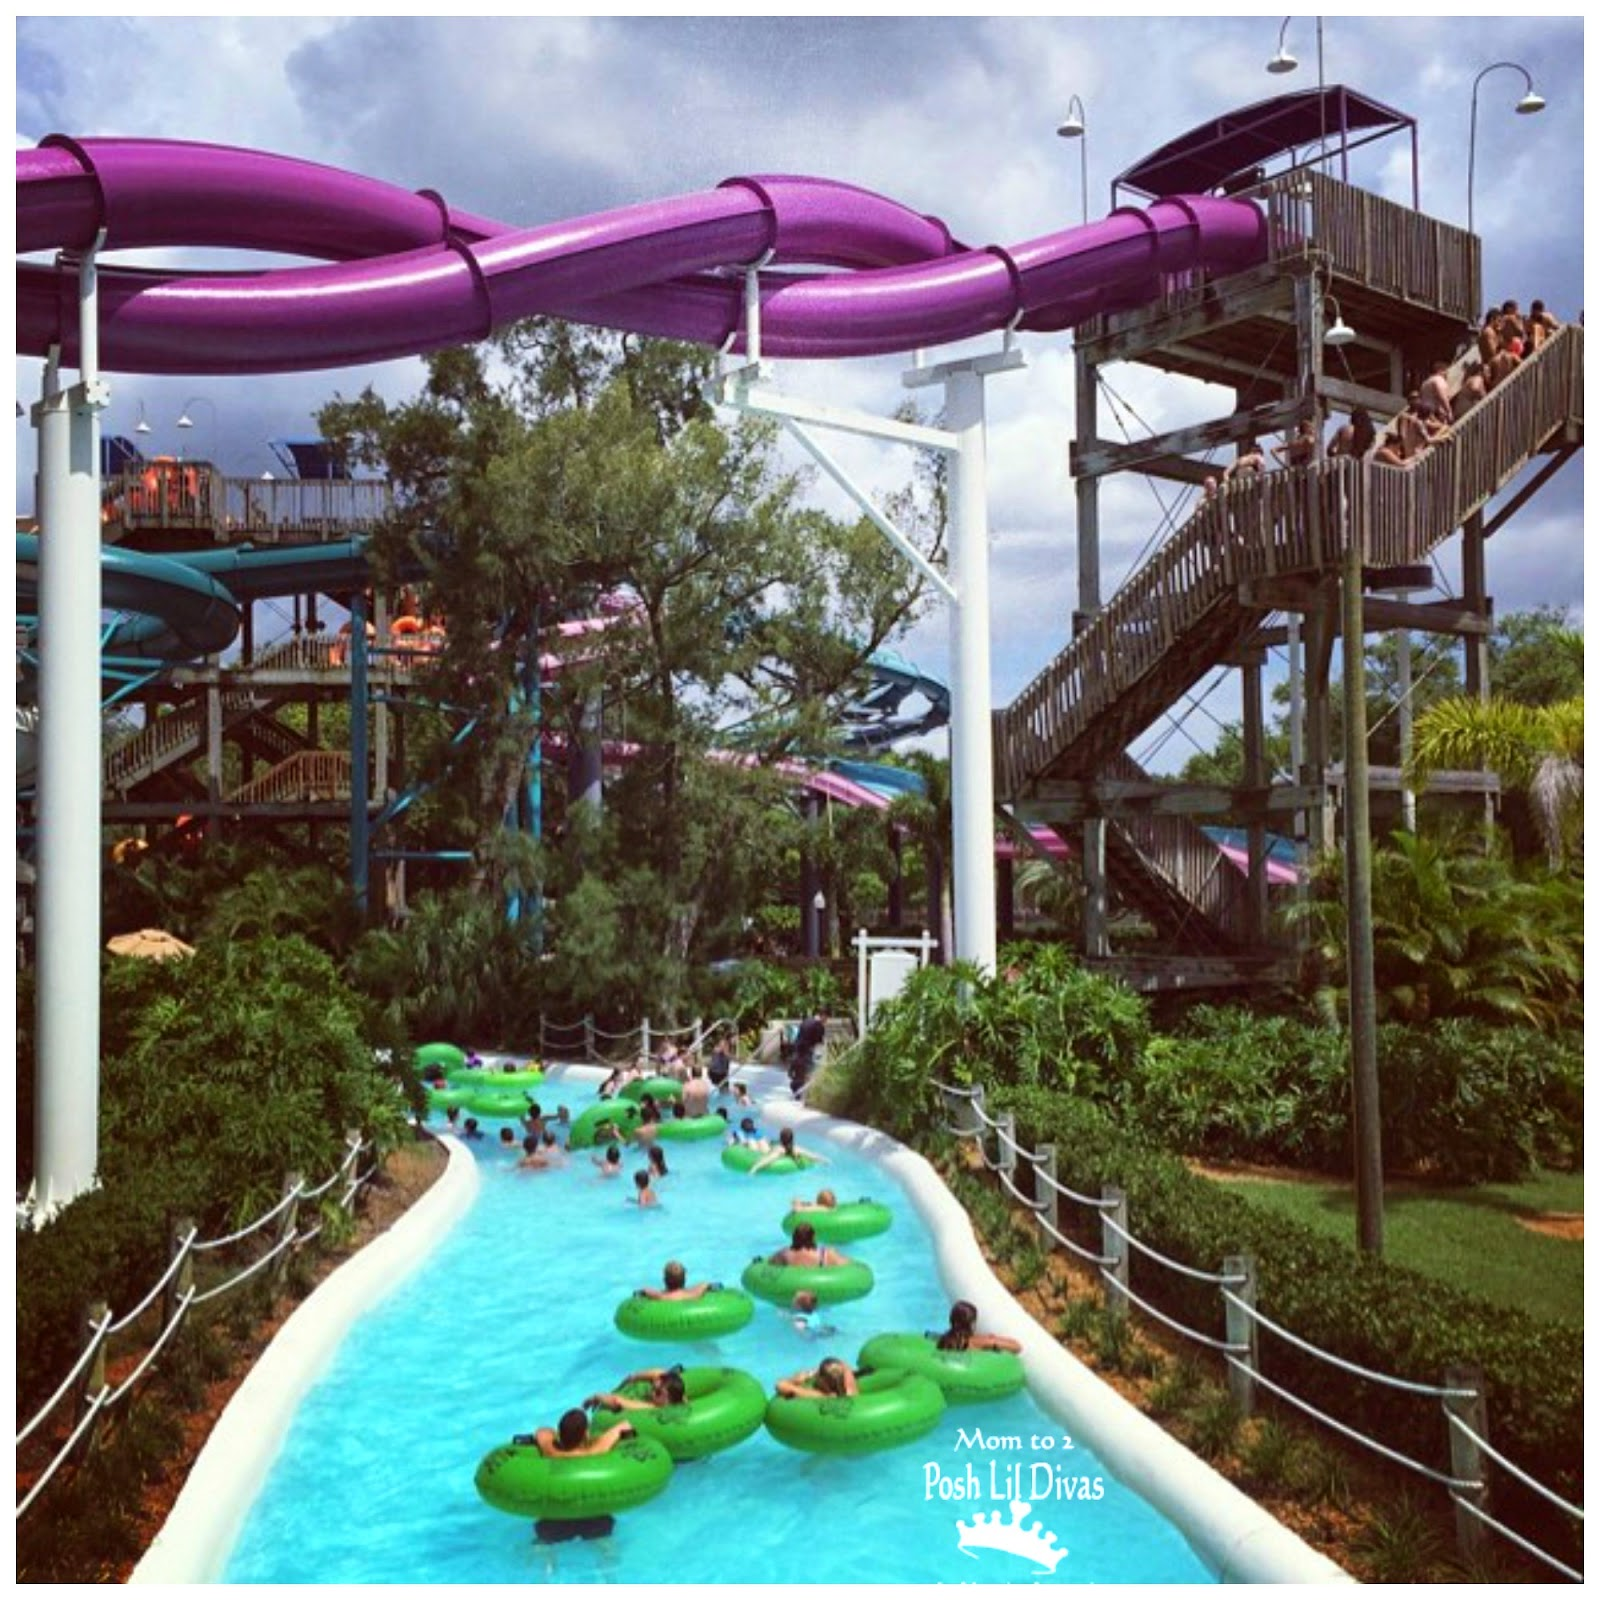 Adventure island water park fun tampa florida - Busch gardens and adventure island ...